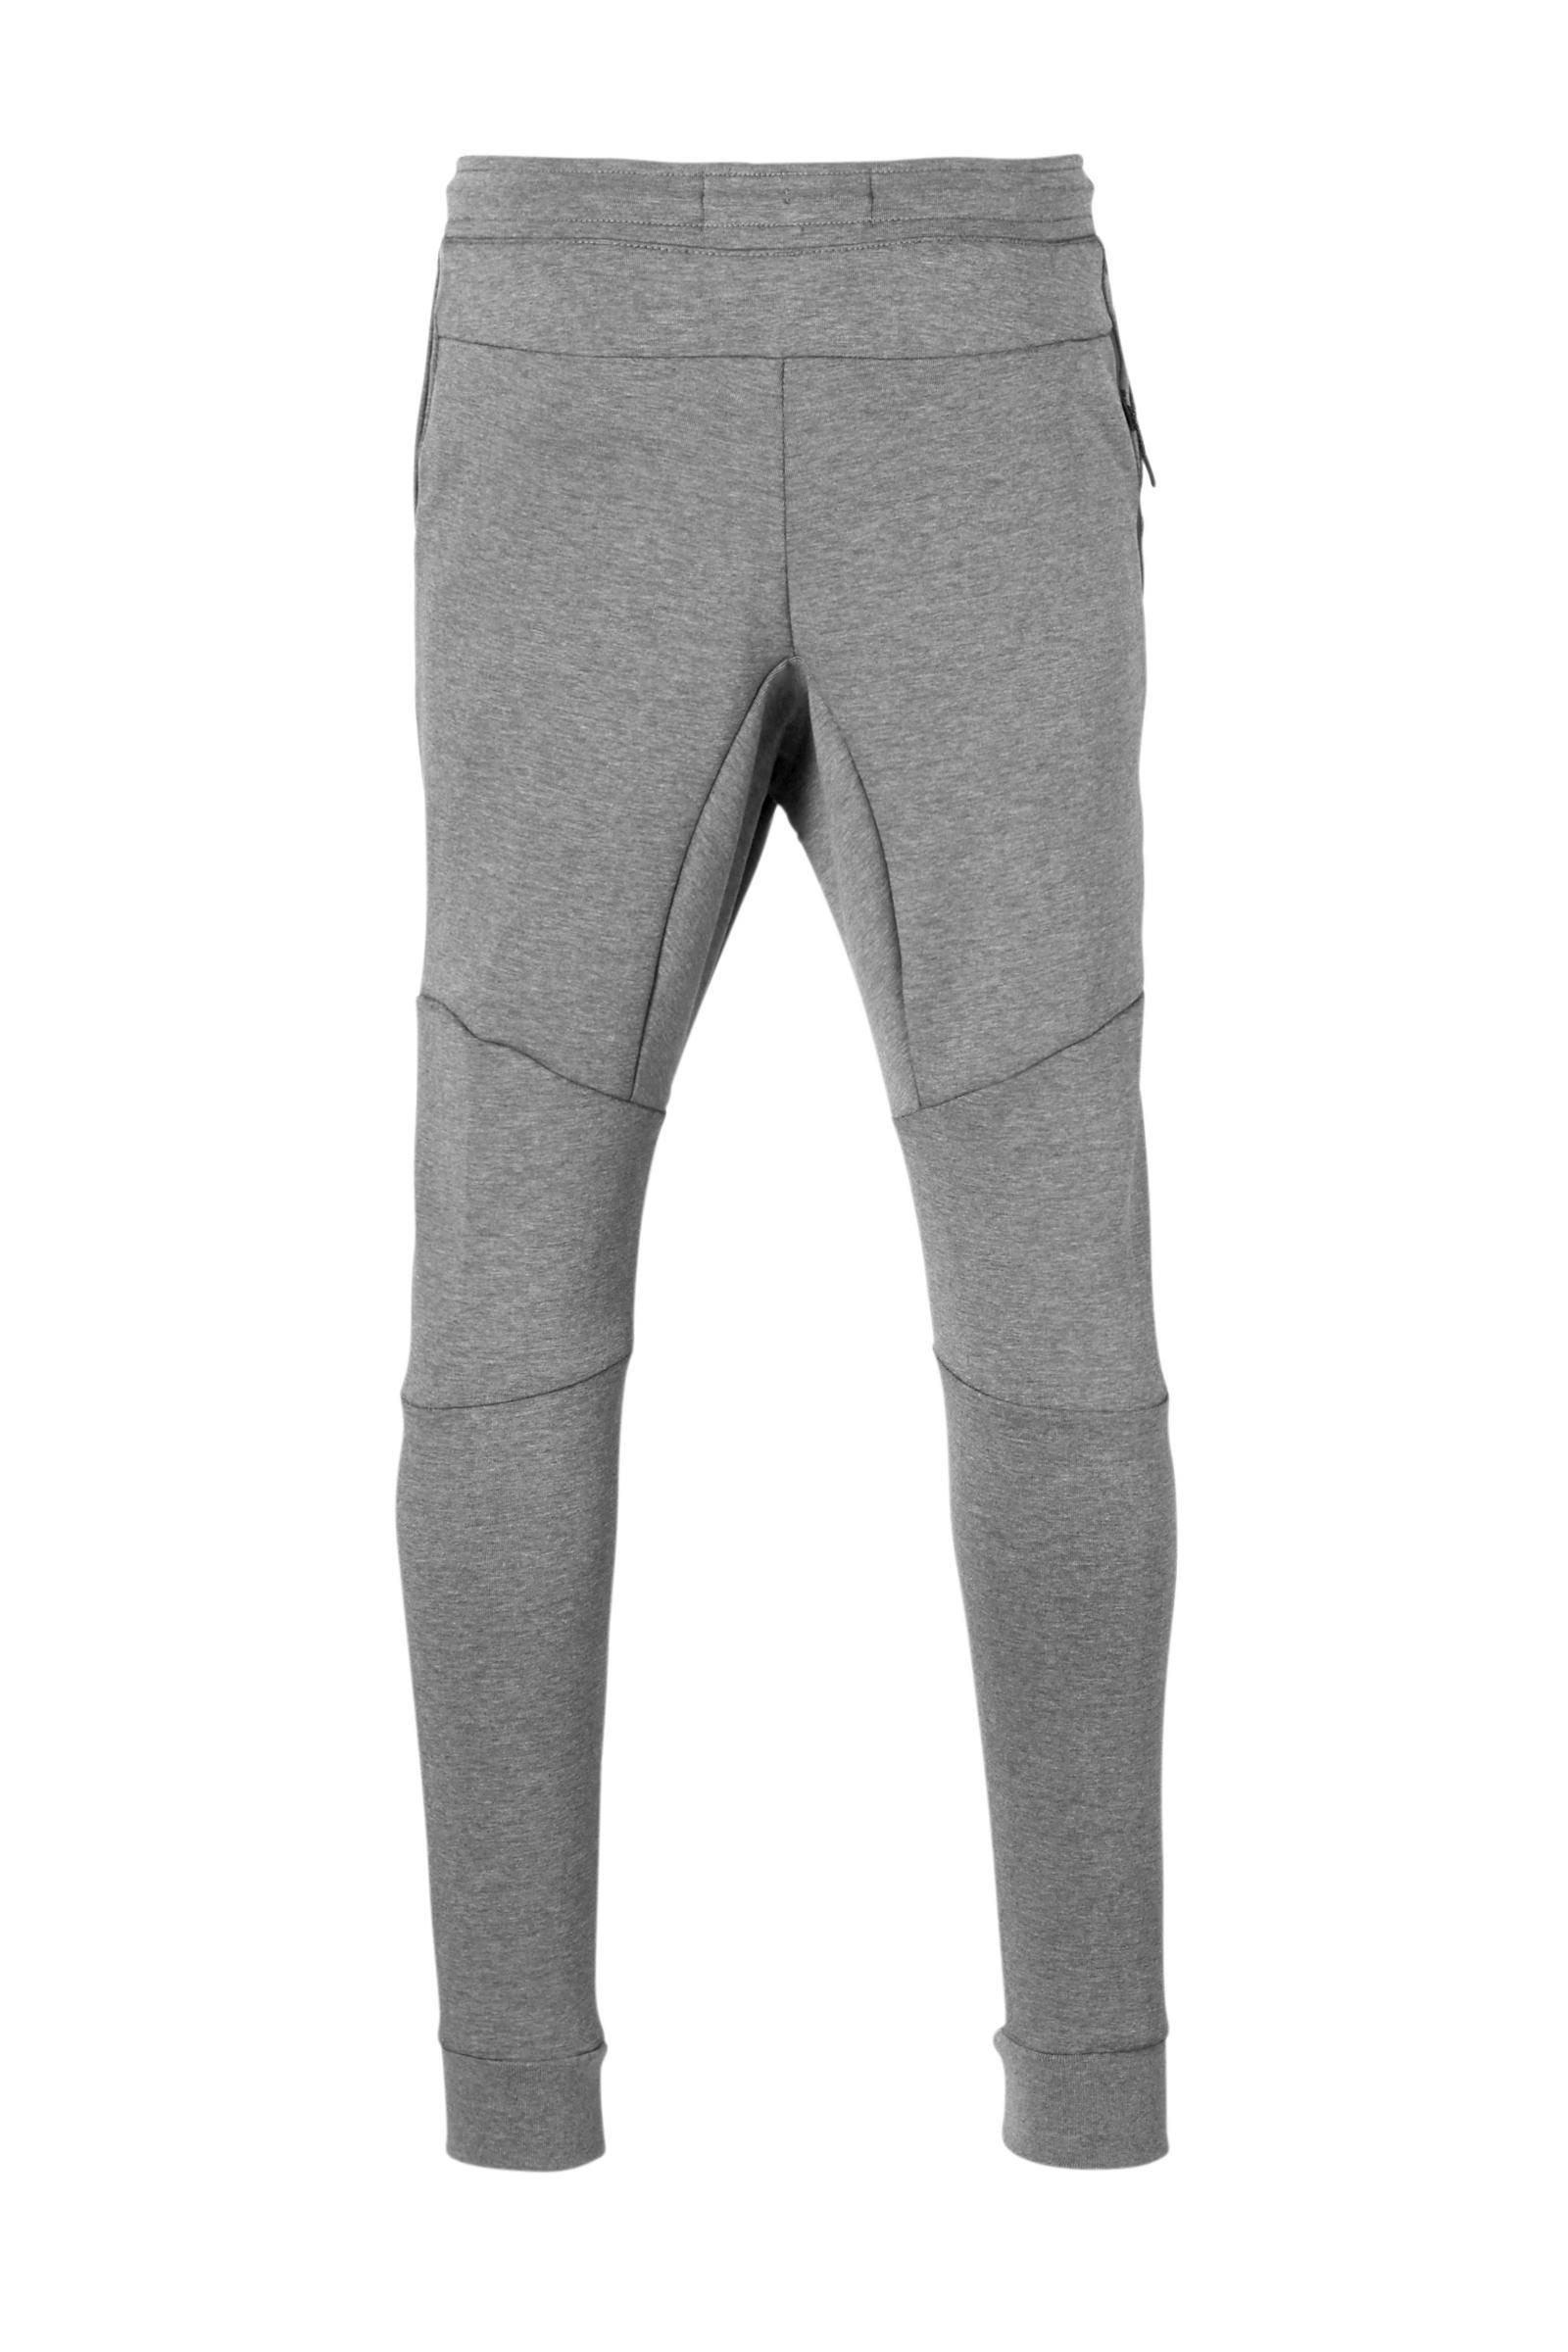 Nike Tech Fleece joggingbroek   wehkamp